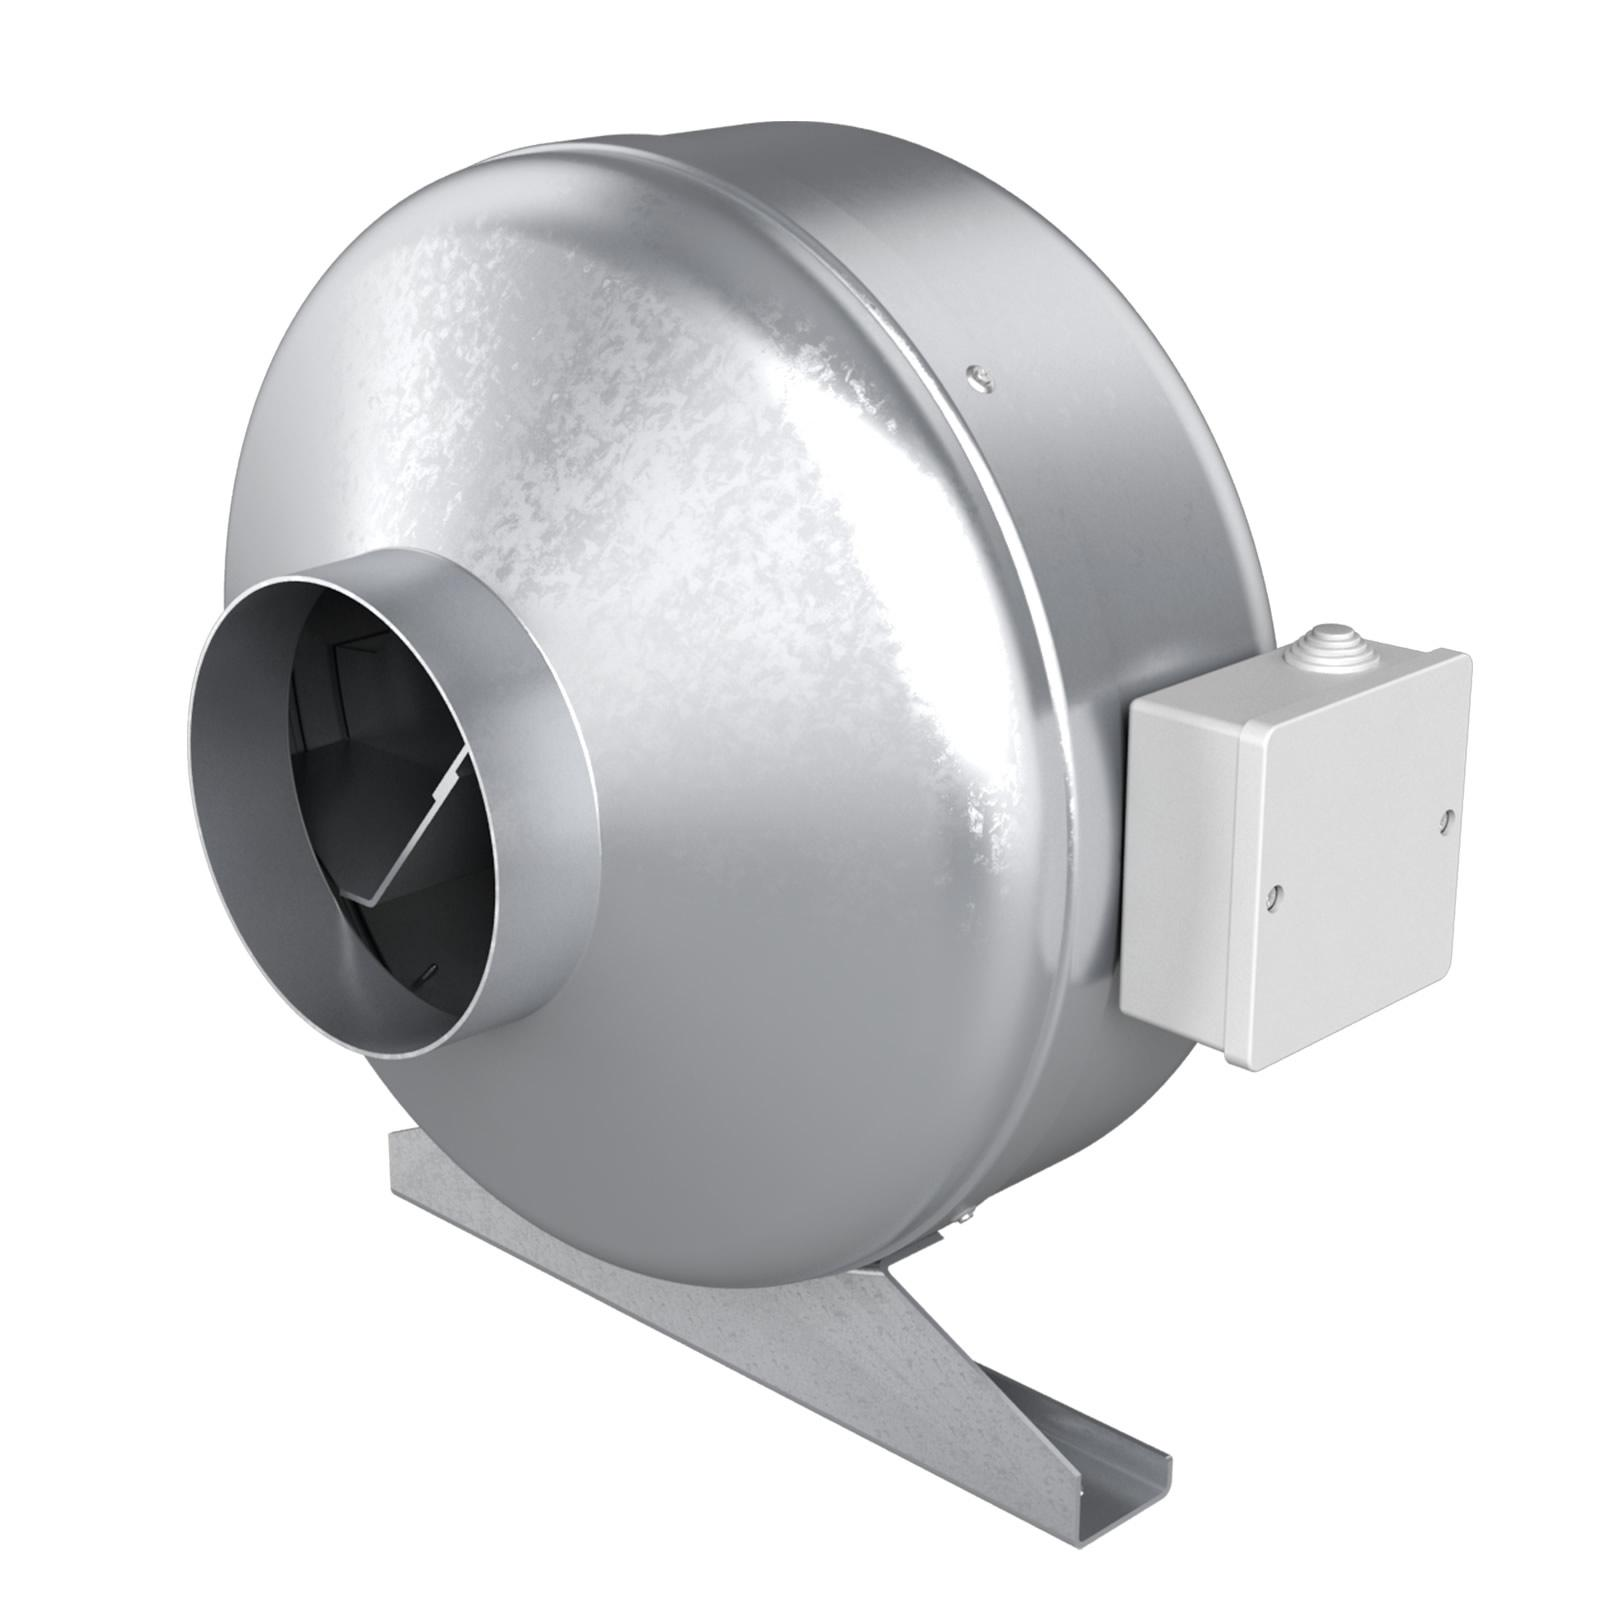 Вентилятор Era Mars gdf 250